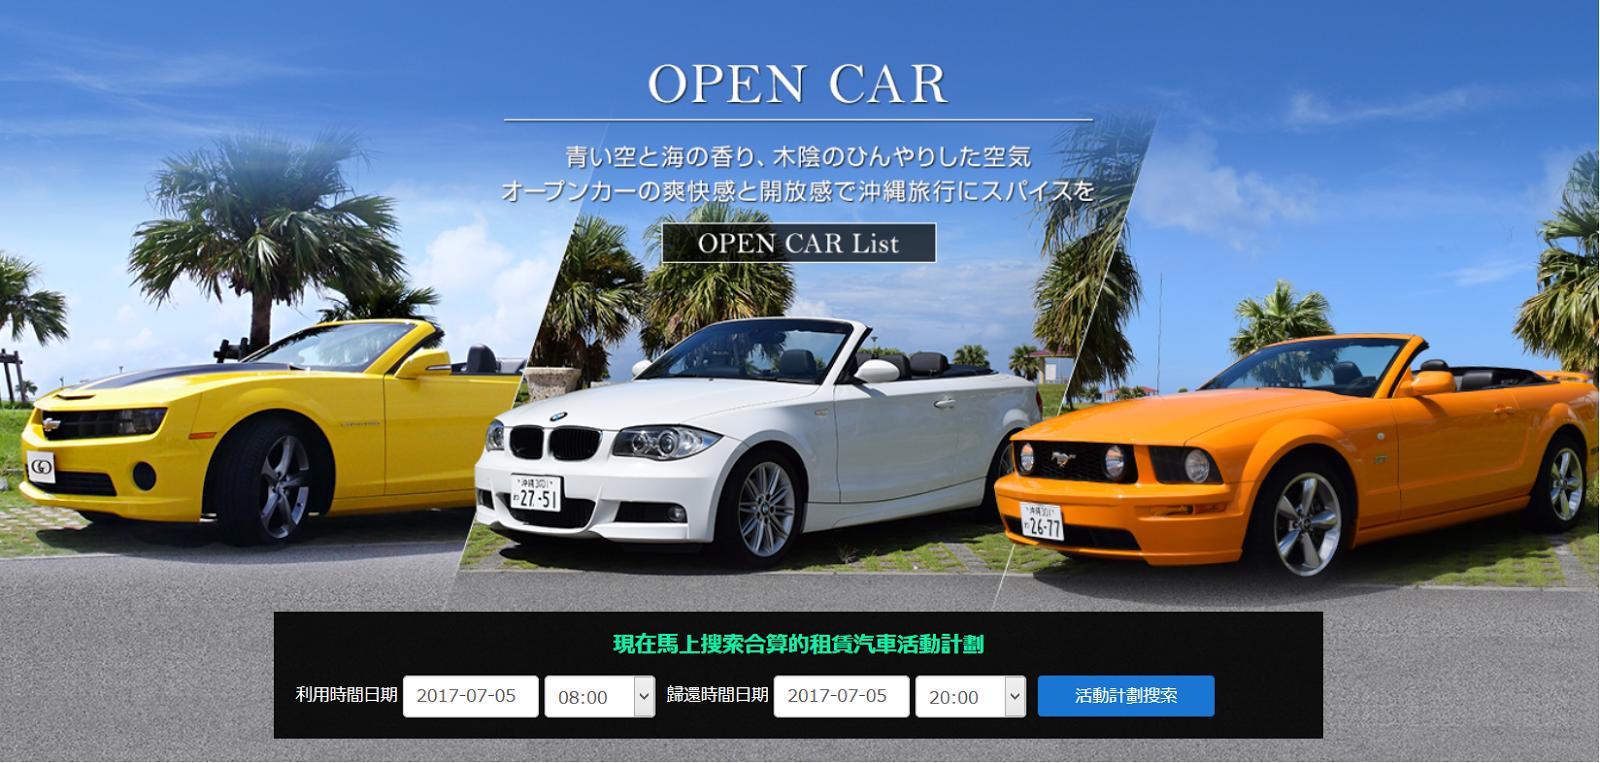 Grace-Okinawa-%25E6%25B2%2596%25E7%25B9%25A9-%25E7%25A7%259F%25E8%25BB%258A-%25E8%2587%25AA%25E9%25A7%2595-%25E6%258E%25A8%25E8%2596%25A6-rental-car-沖繩-租車-自駕-推薦-比價